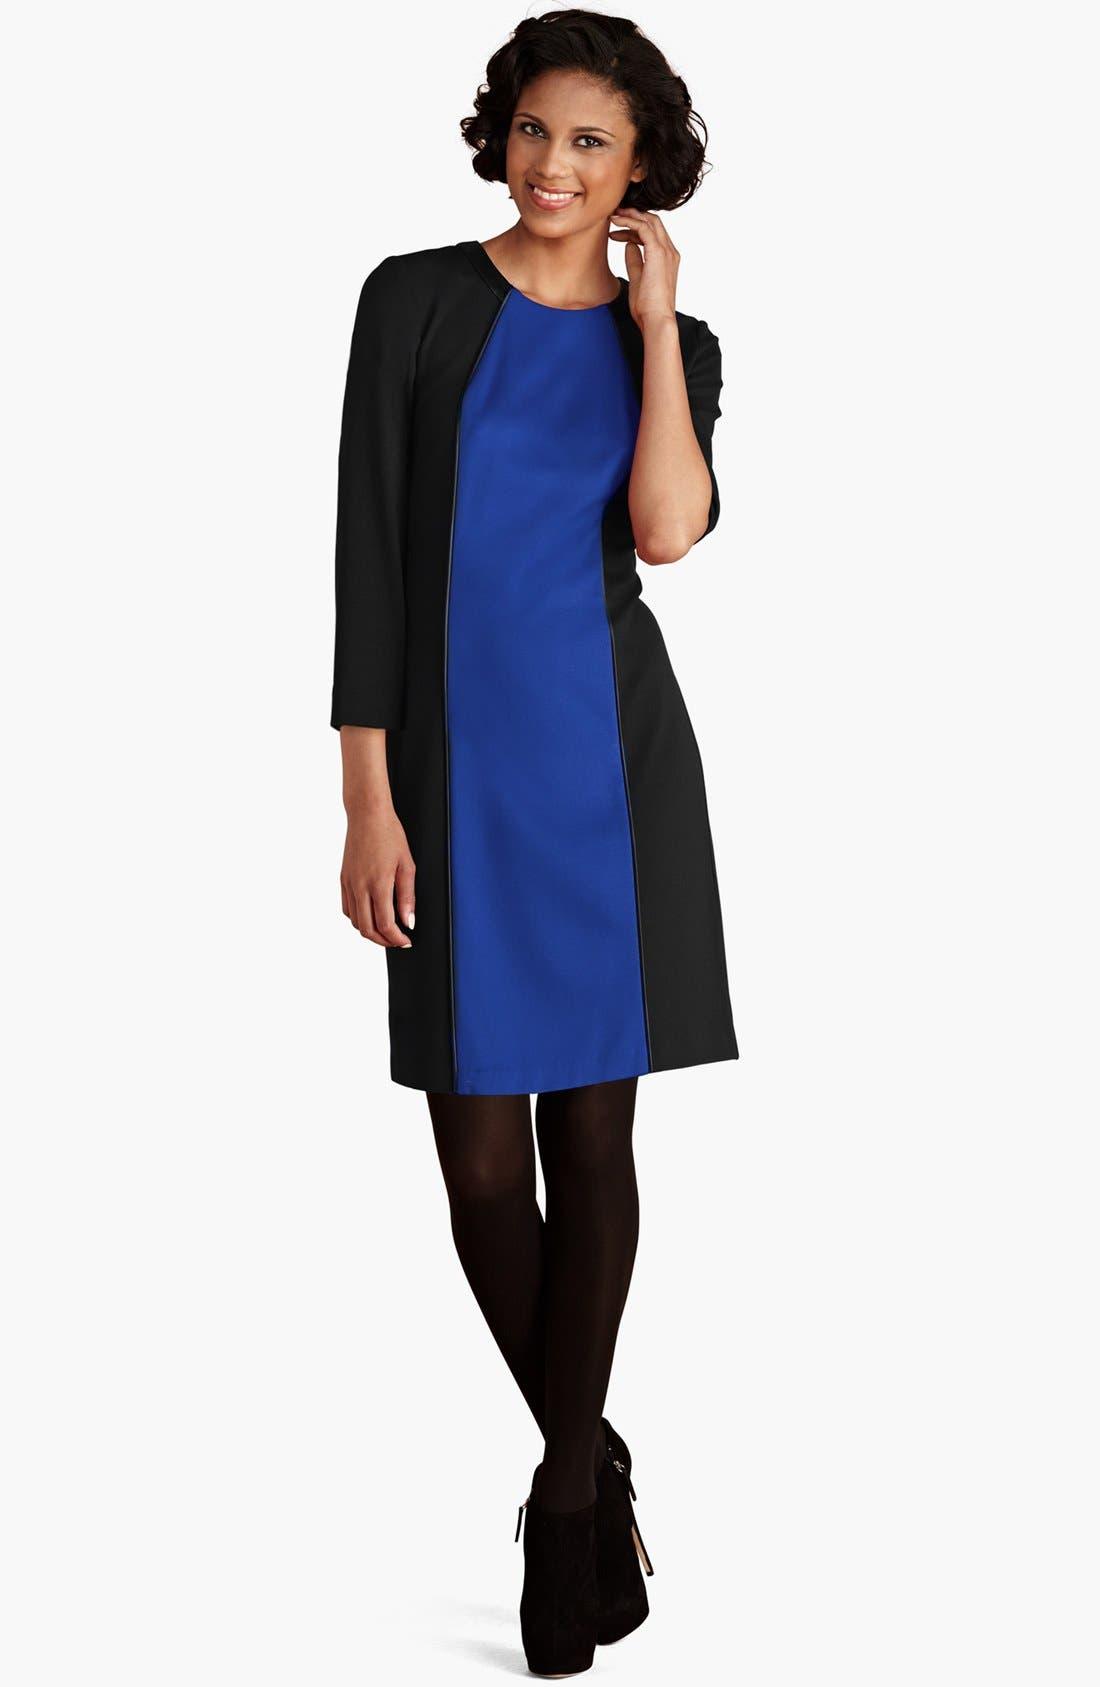 Alternate Image 1 Selected - Donna Morgan Faux Leather Trim Colorblock Dress